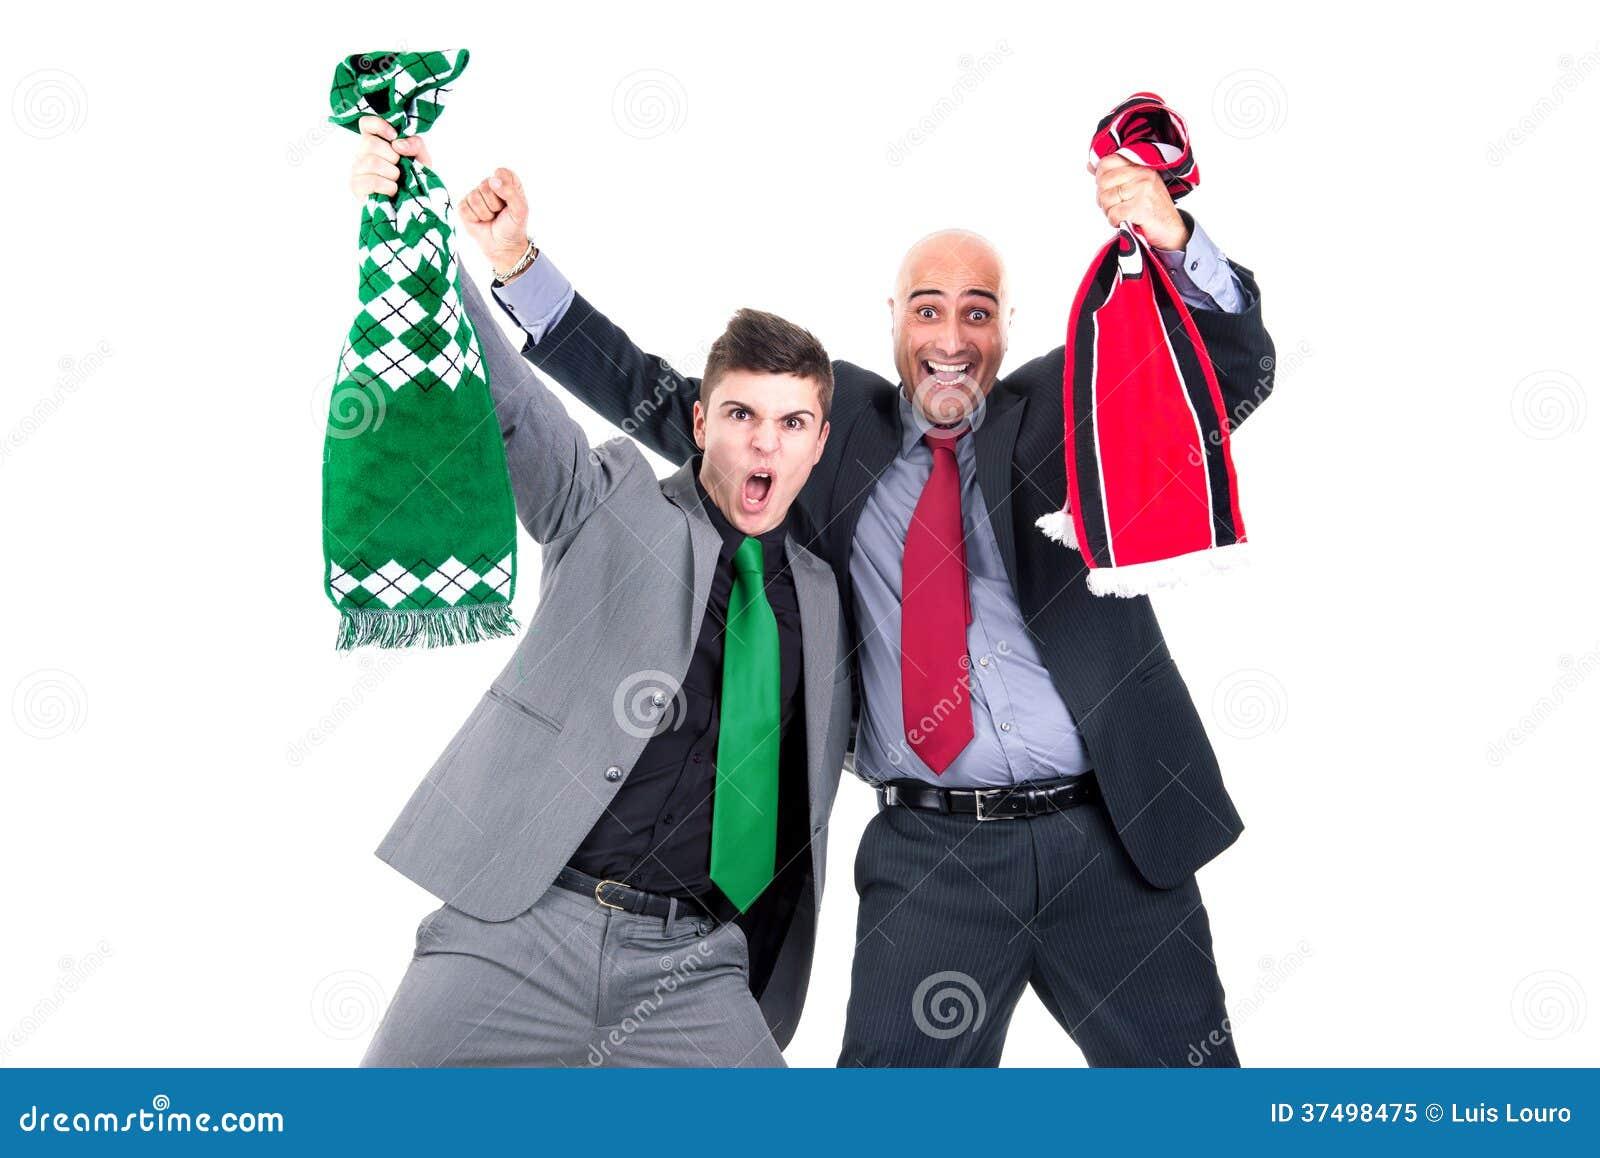 Amamos fútbol